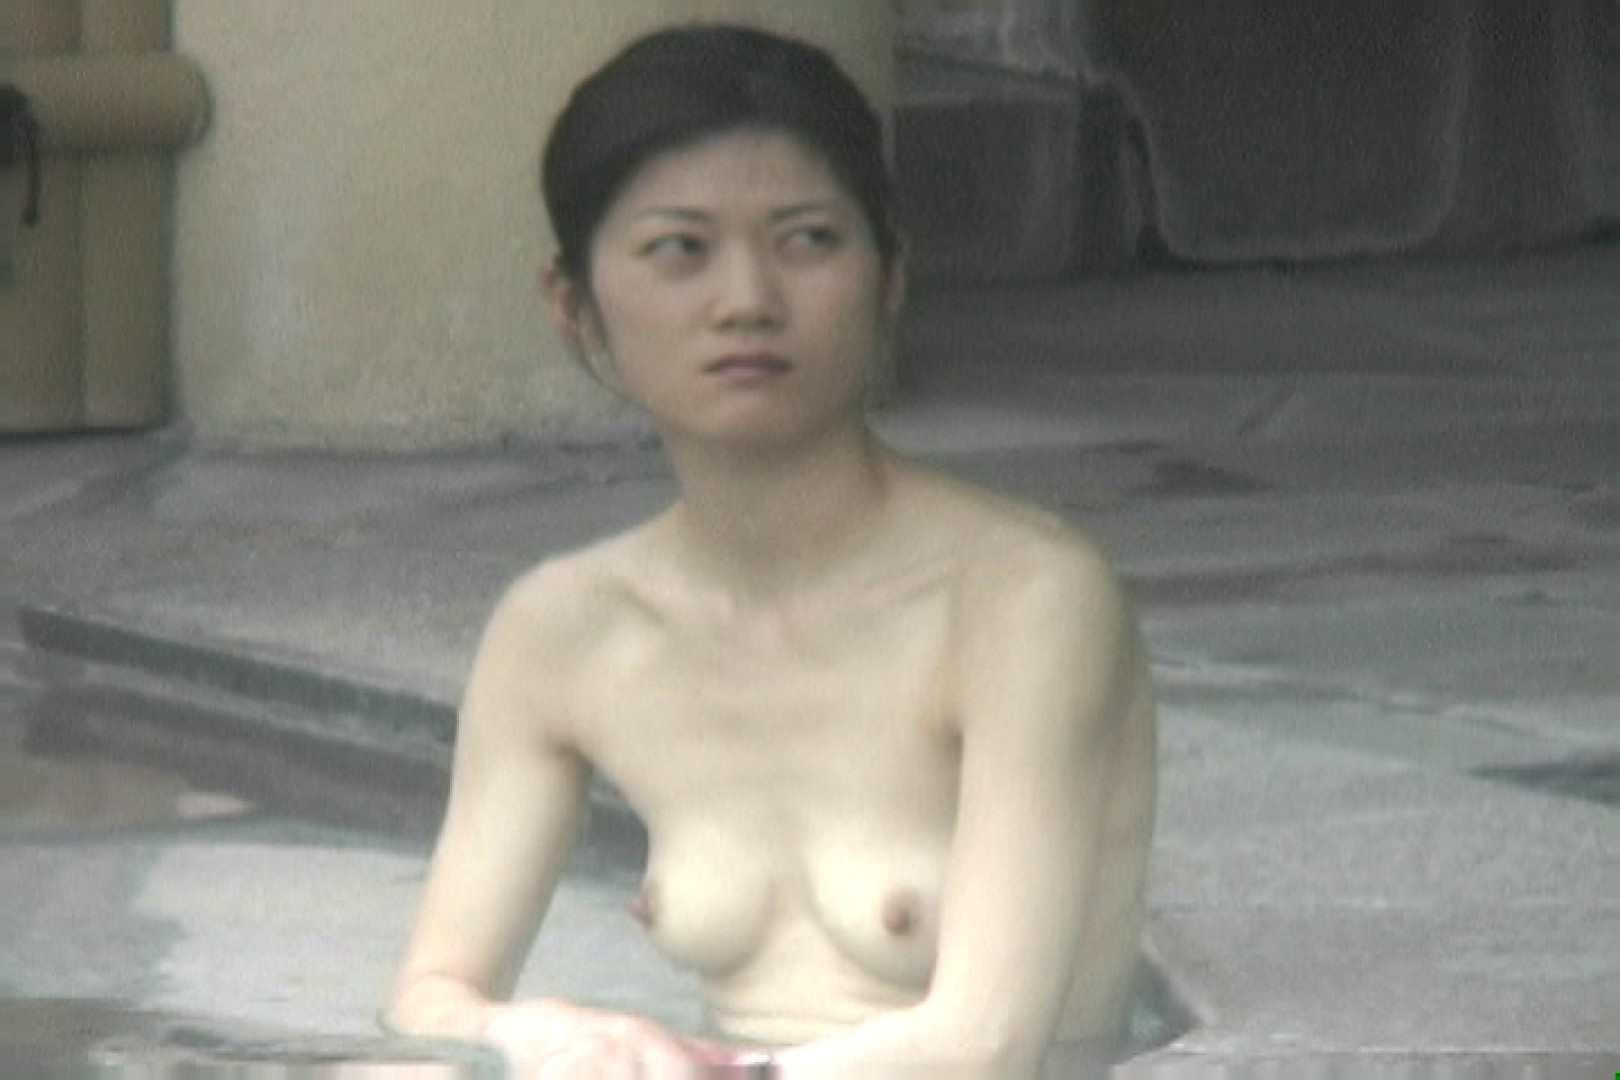 Aquaな露天風呂Vol.686 HなOL のぞき動画キャプチャ 83pic 47